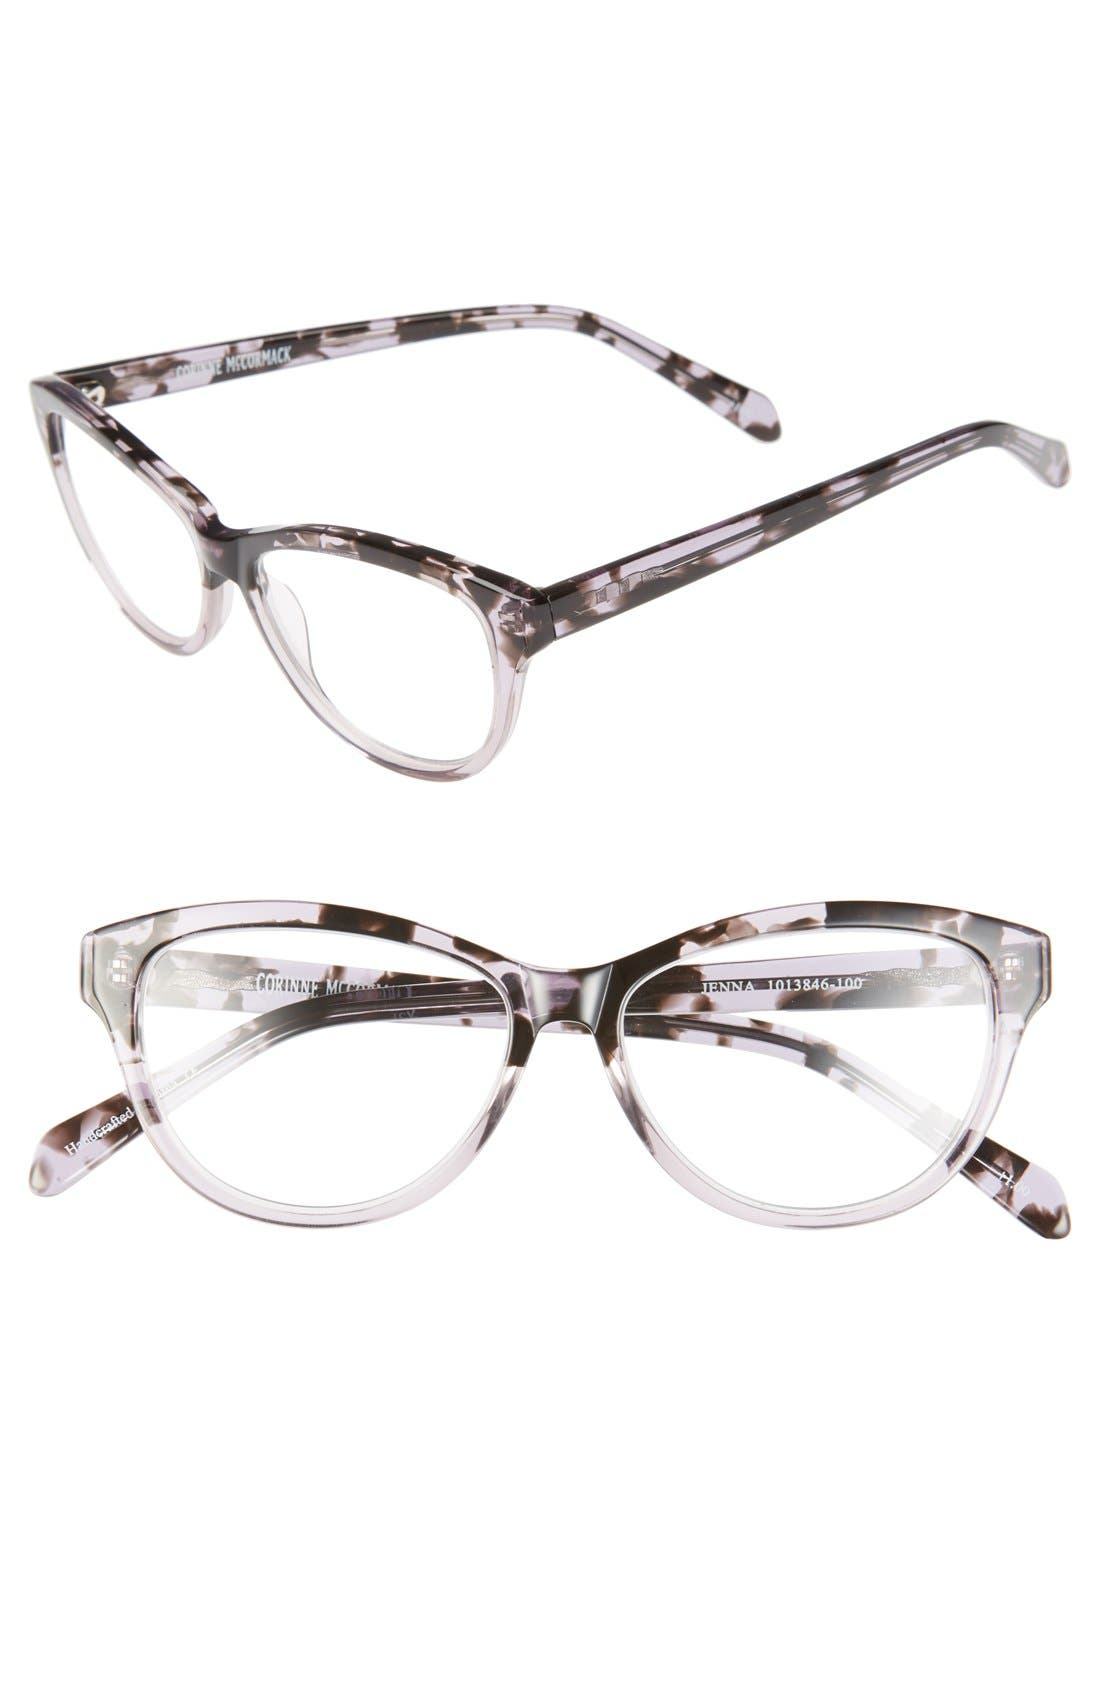 Alternate Image 1 Selected - Corinne McCormack 'Jenna' 50mm Reading Glasses